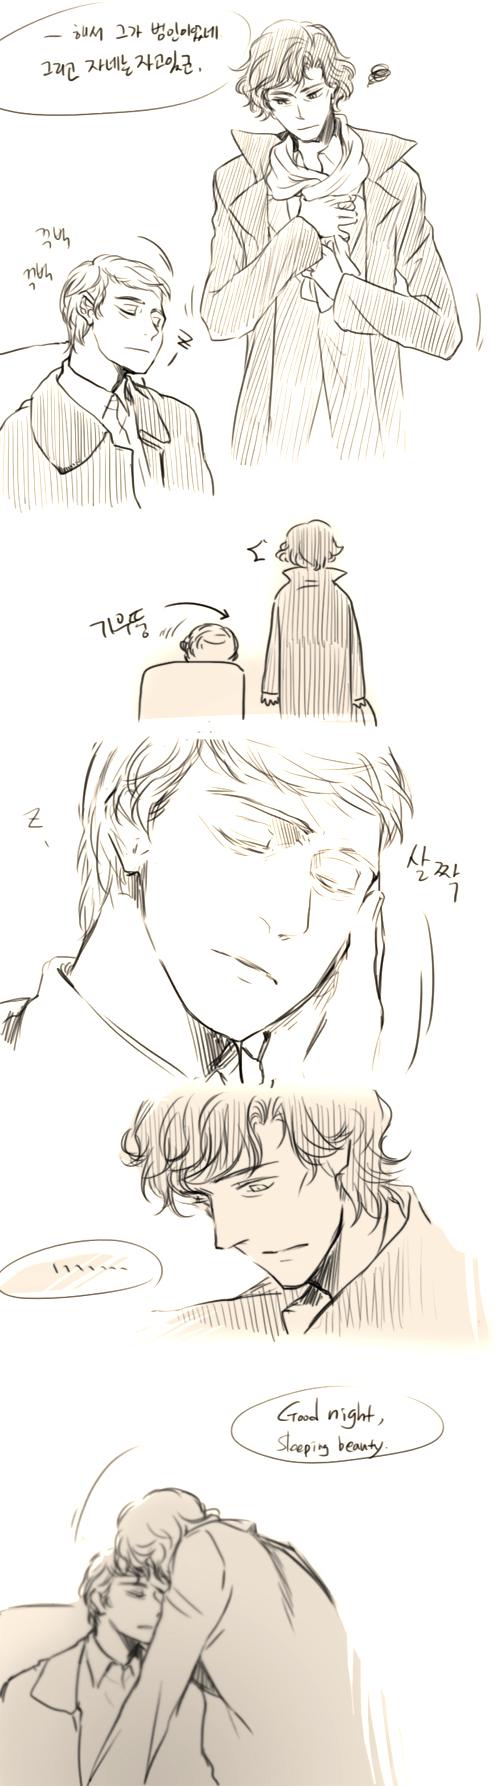 good night by madtenka